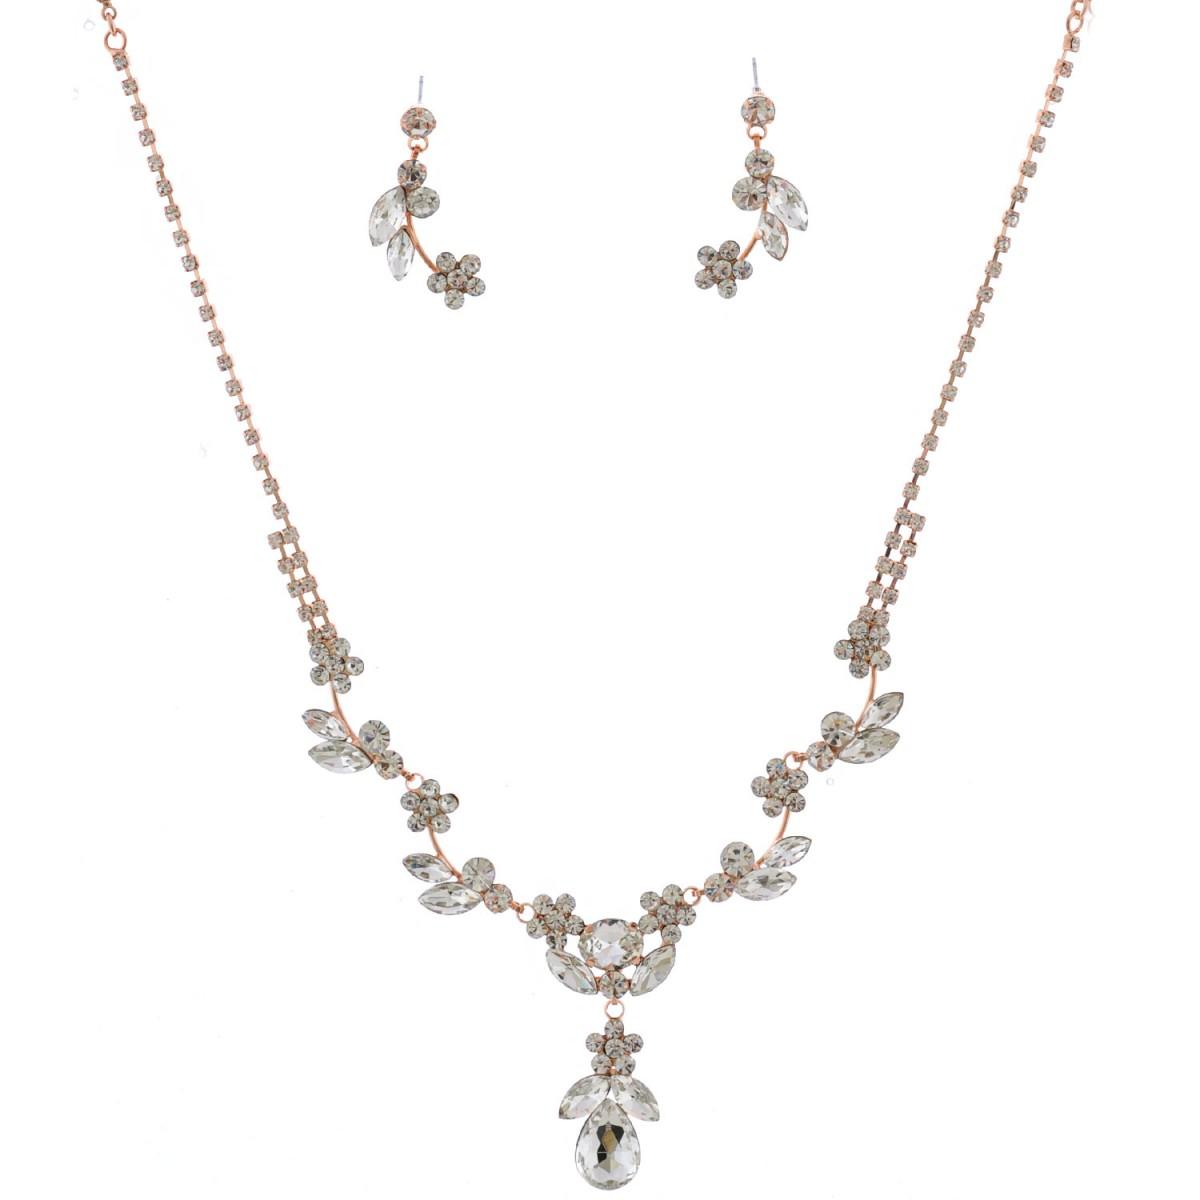 Fashion Jewelry Set Rose Gold Plating Flower Necklace Earrings Set Topwholesalejewel